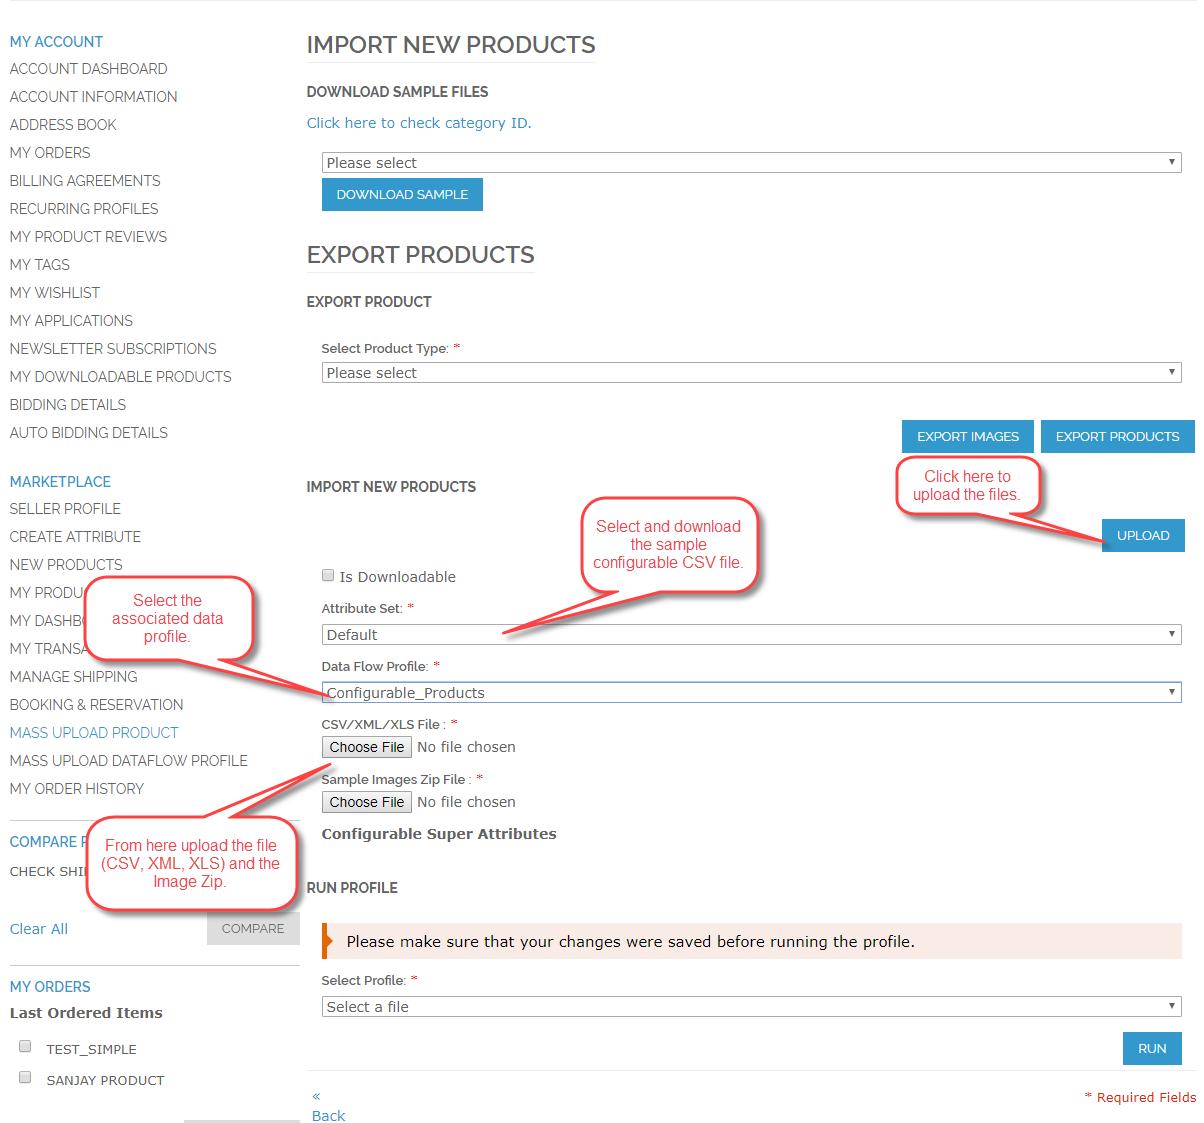 Configurable Product Upload